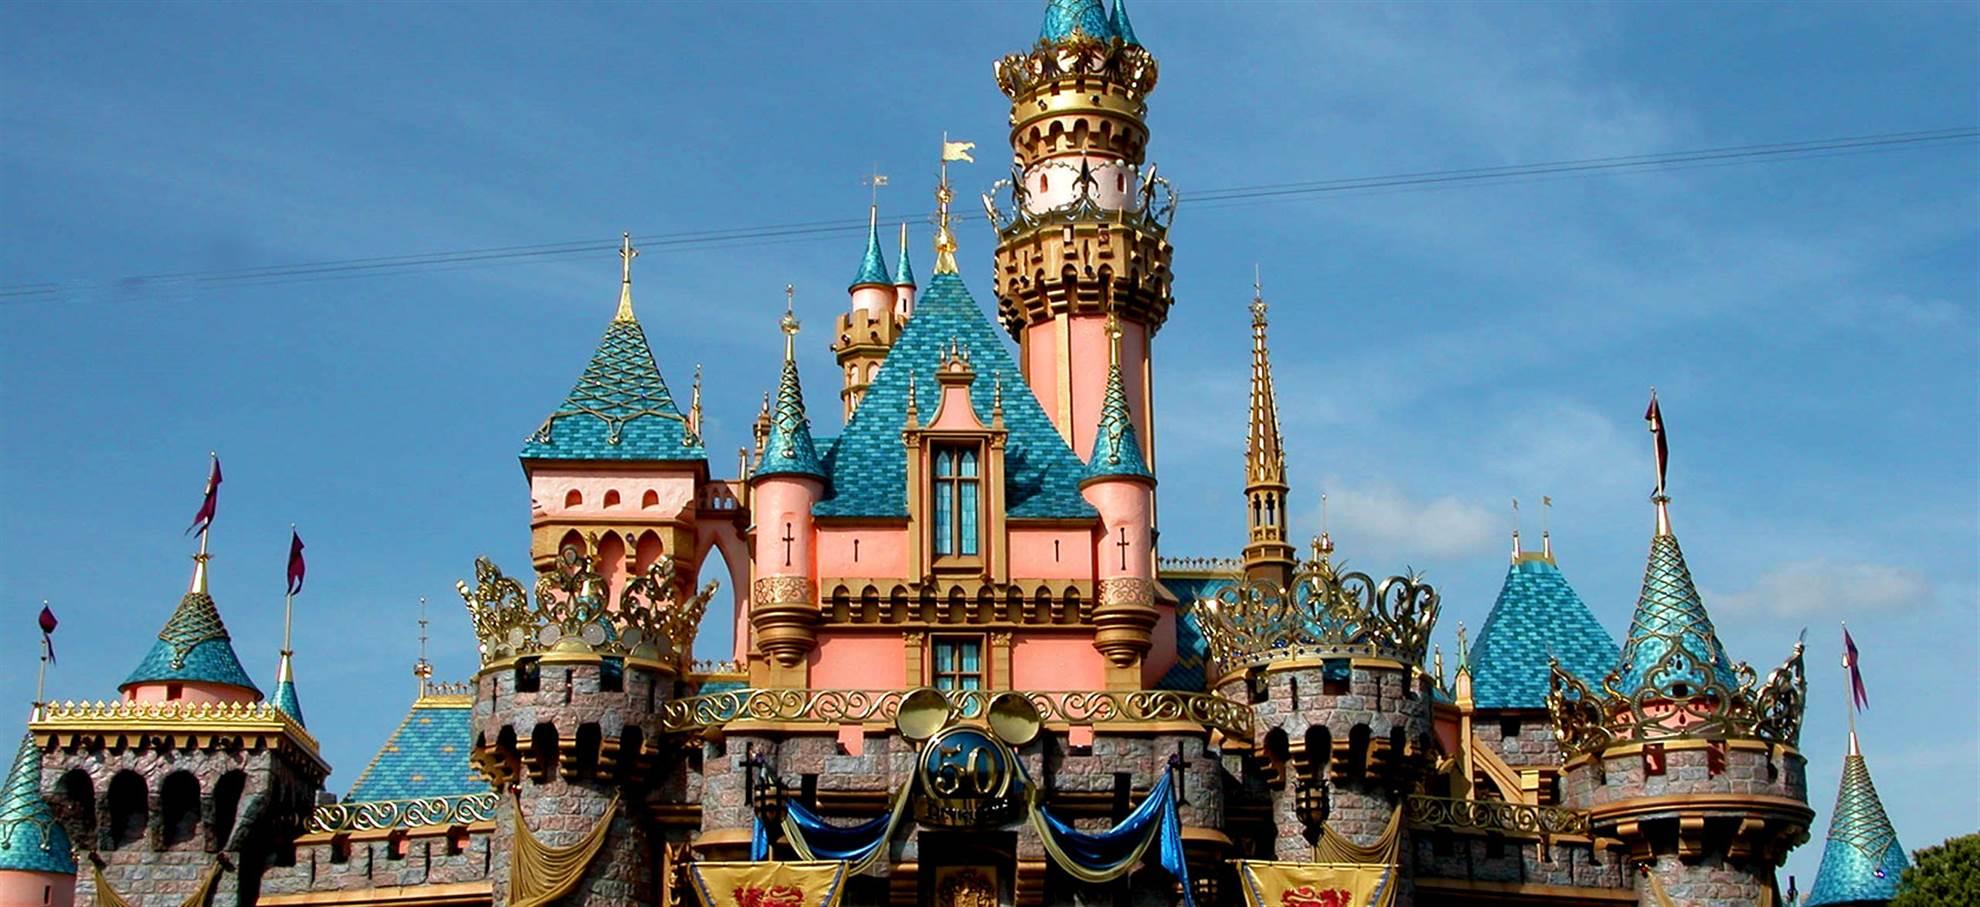 Disneyland® Paris  1 Giorno 2 Parchi con trasporto